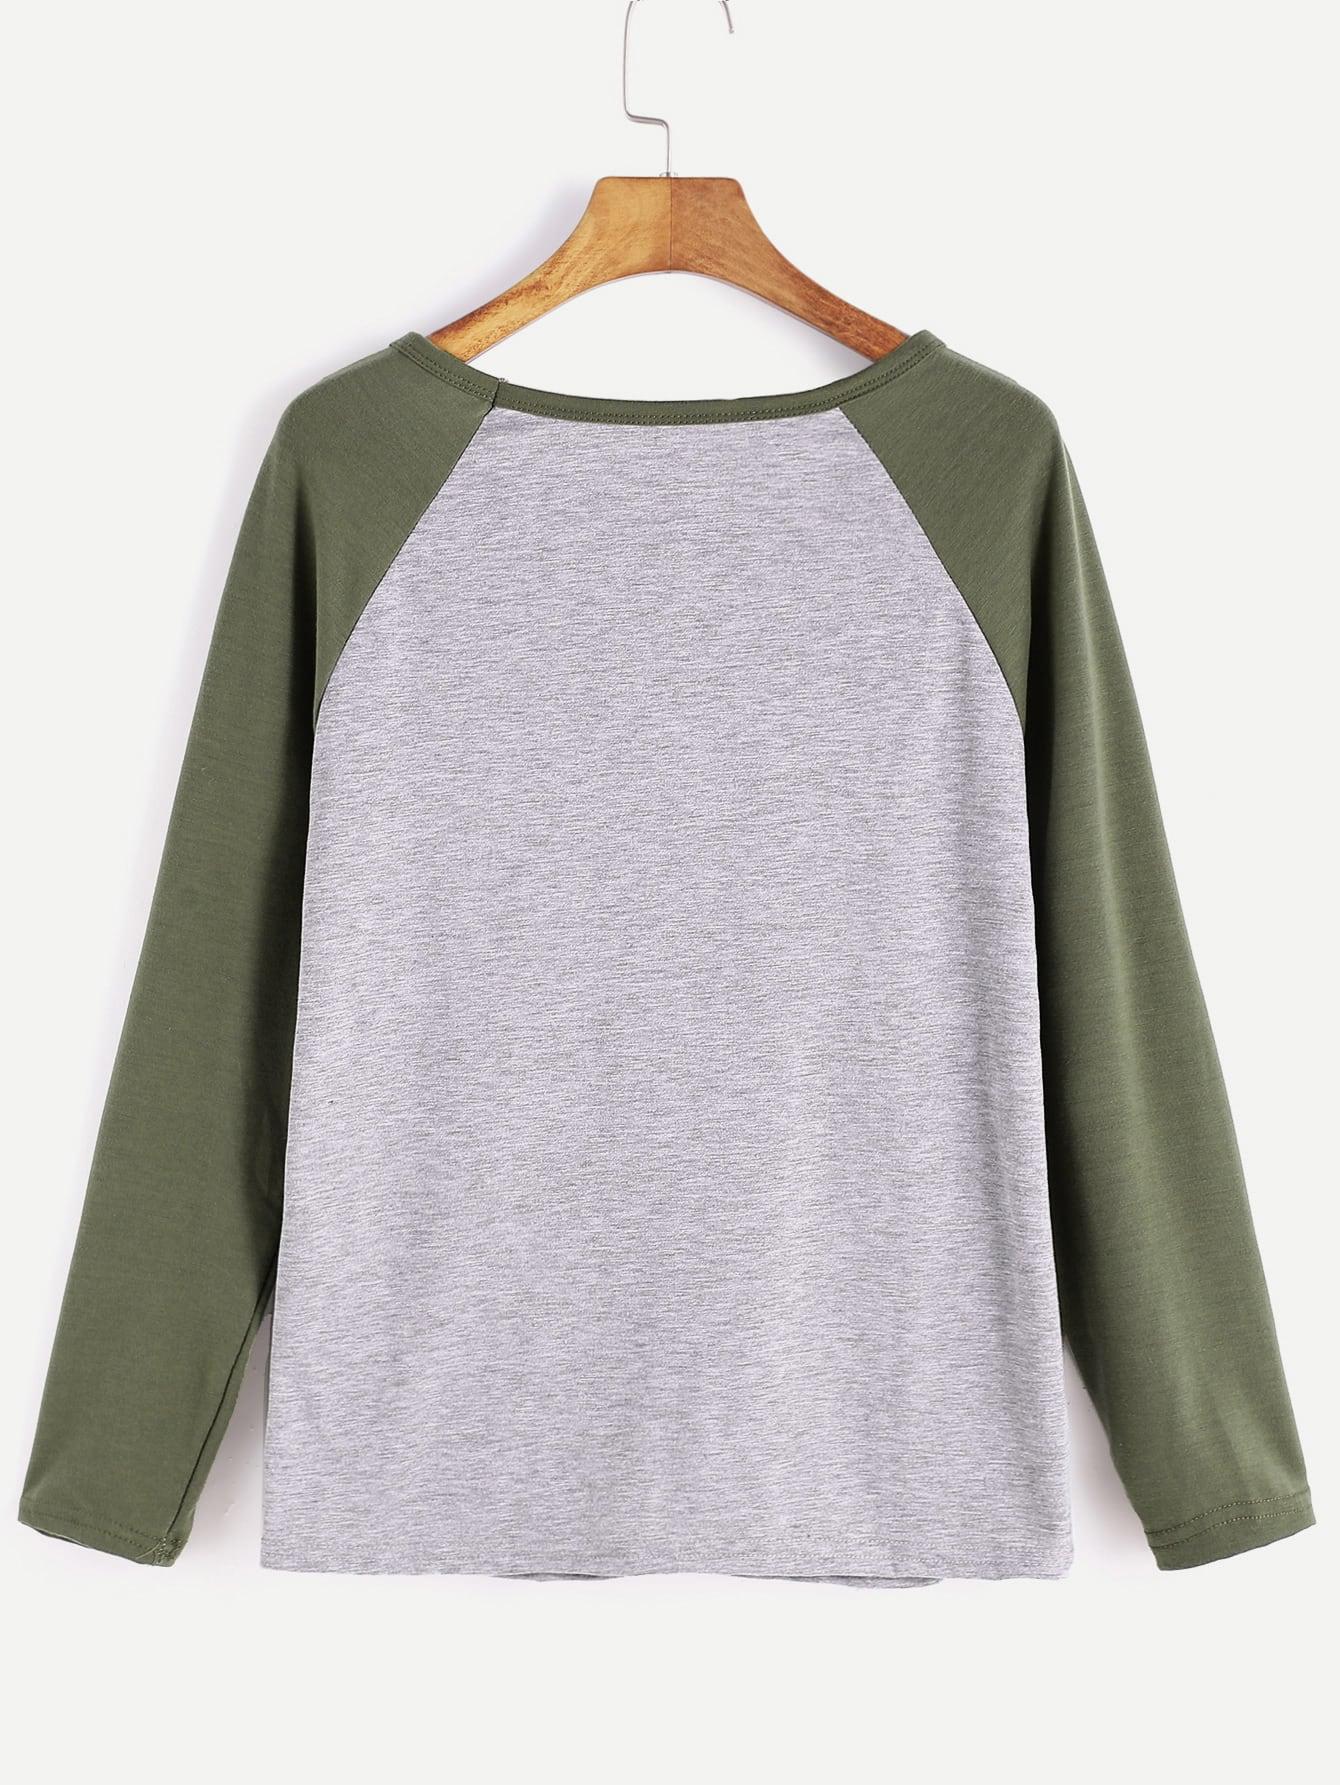 Contrast Raglan Sleeve Letter Print T-Shirt